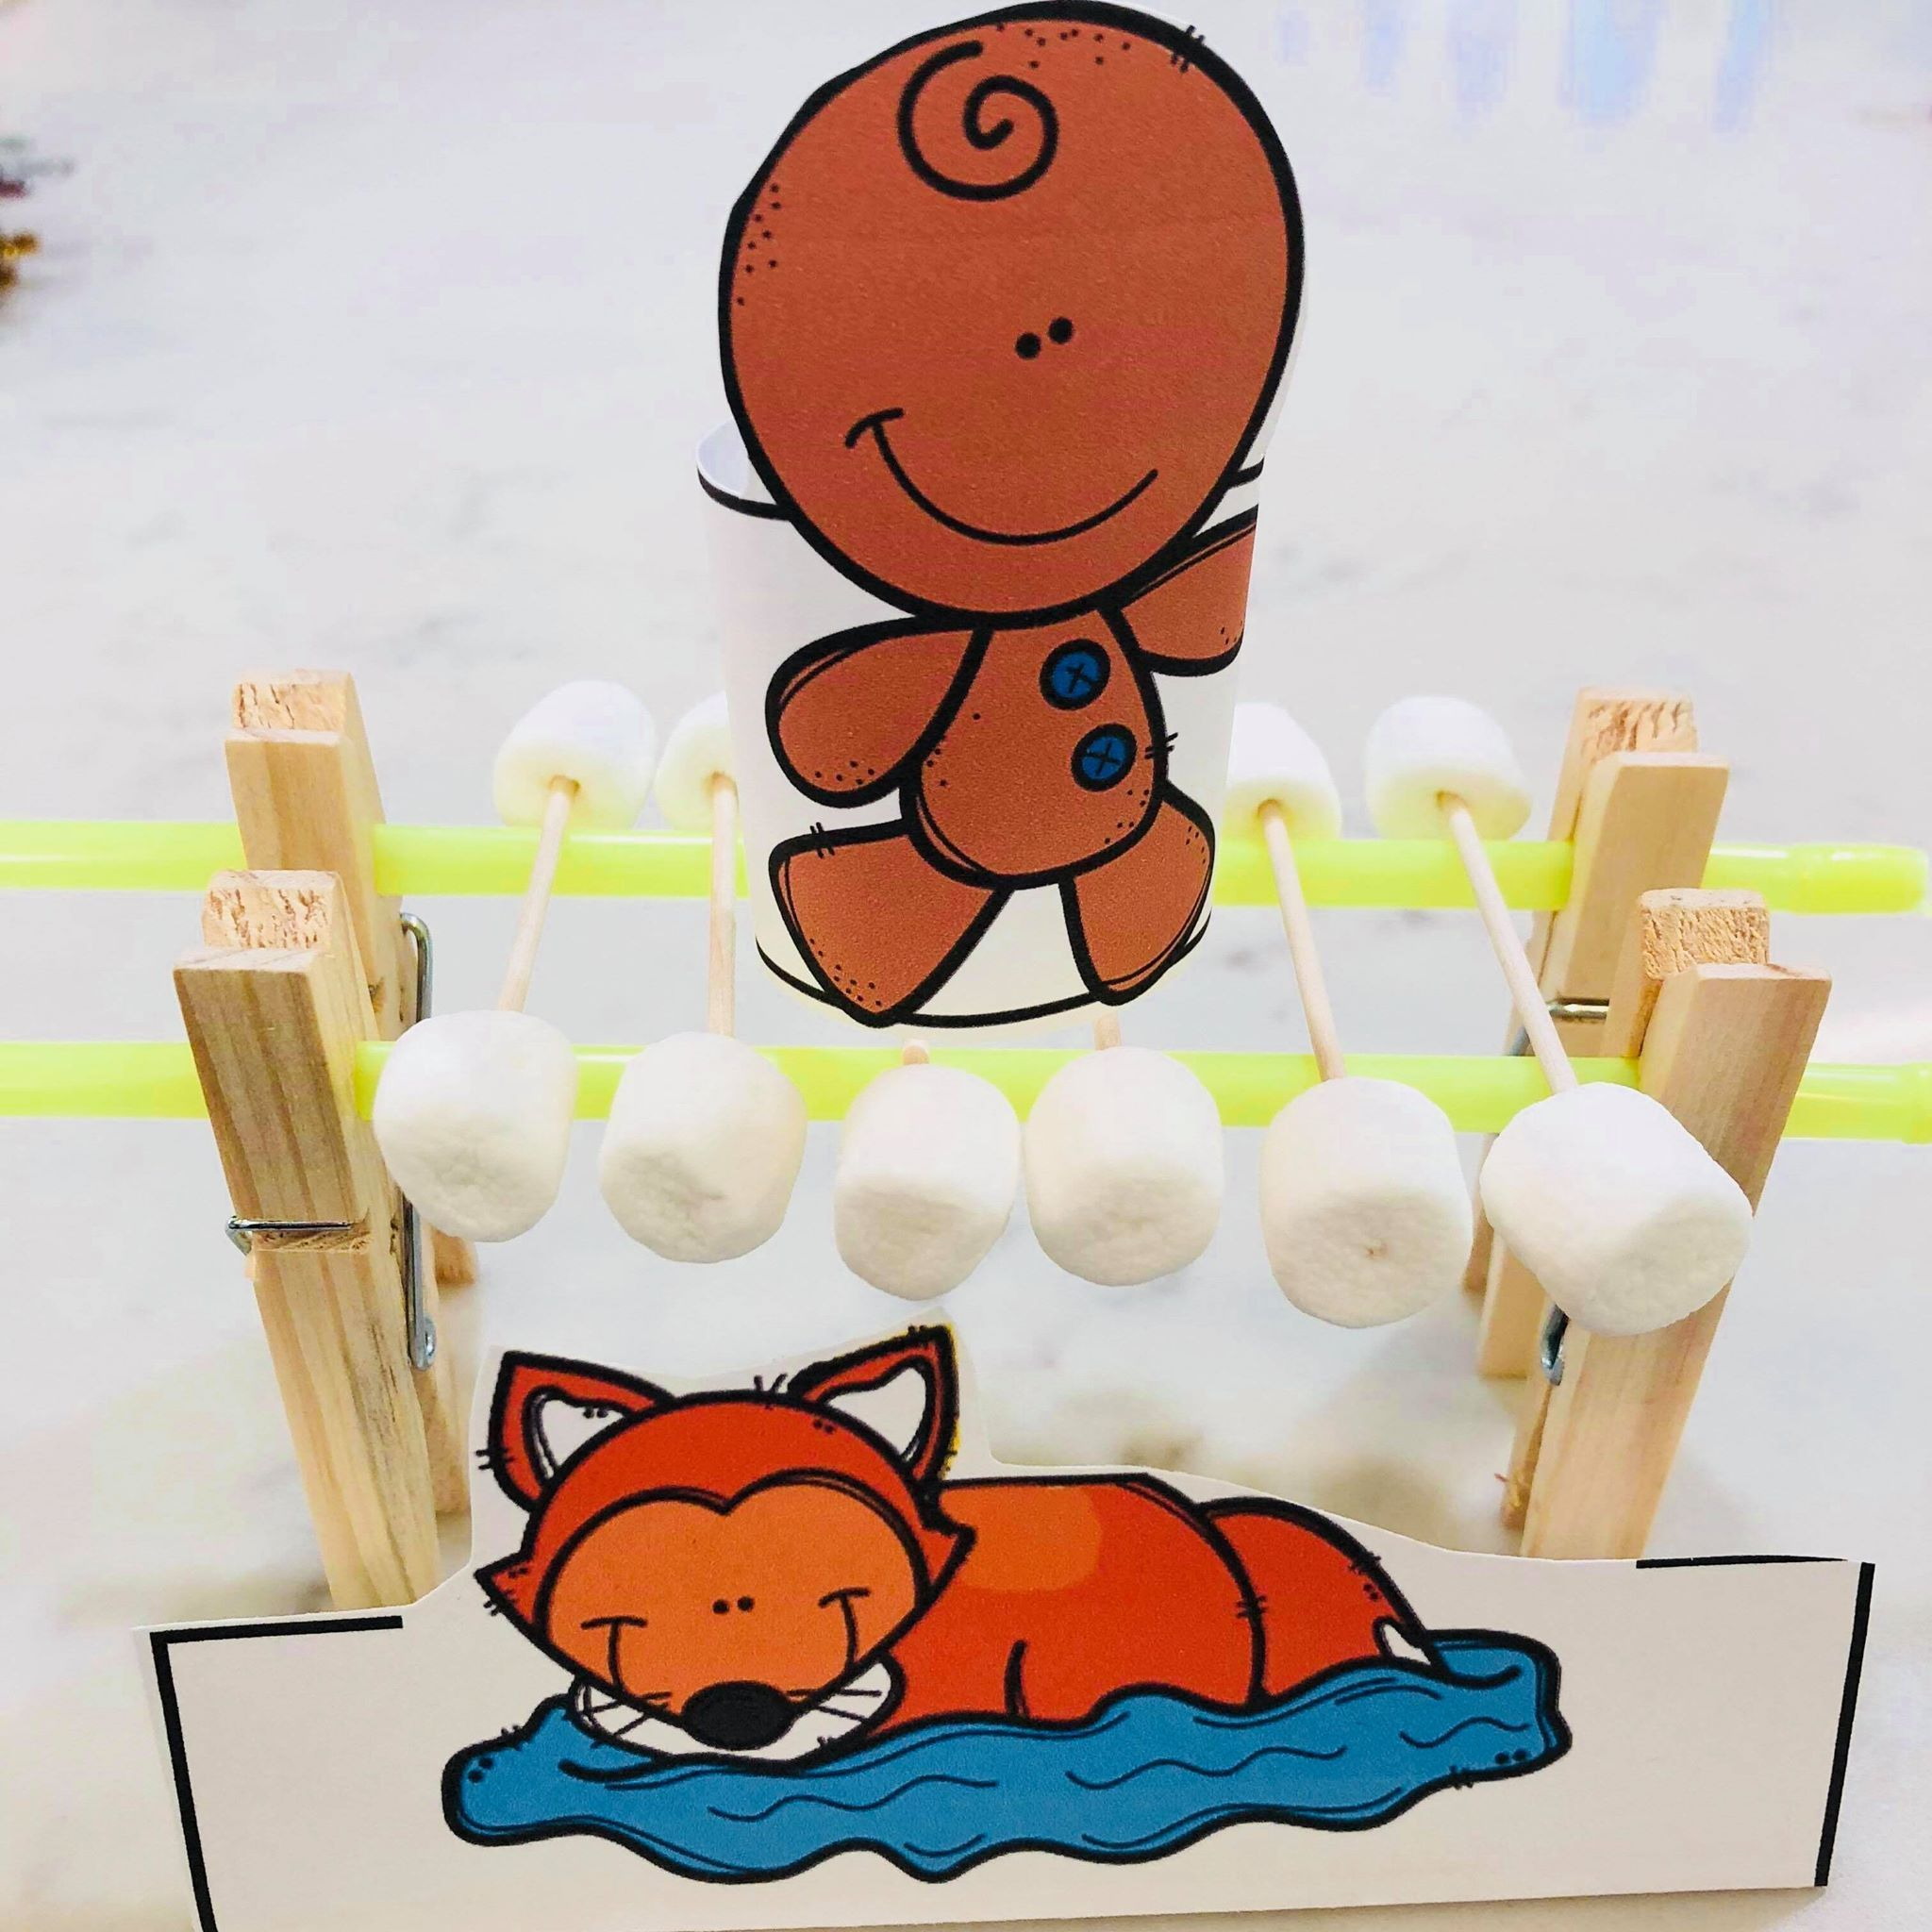 December Christmas Gingerbread Man Stem Learning